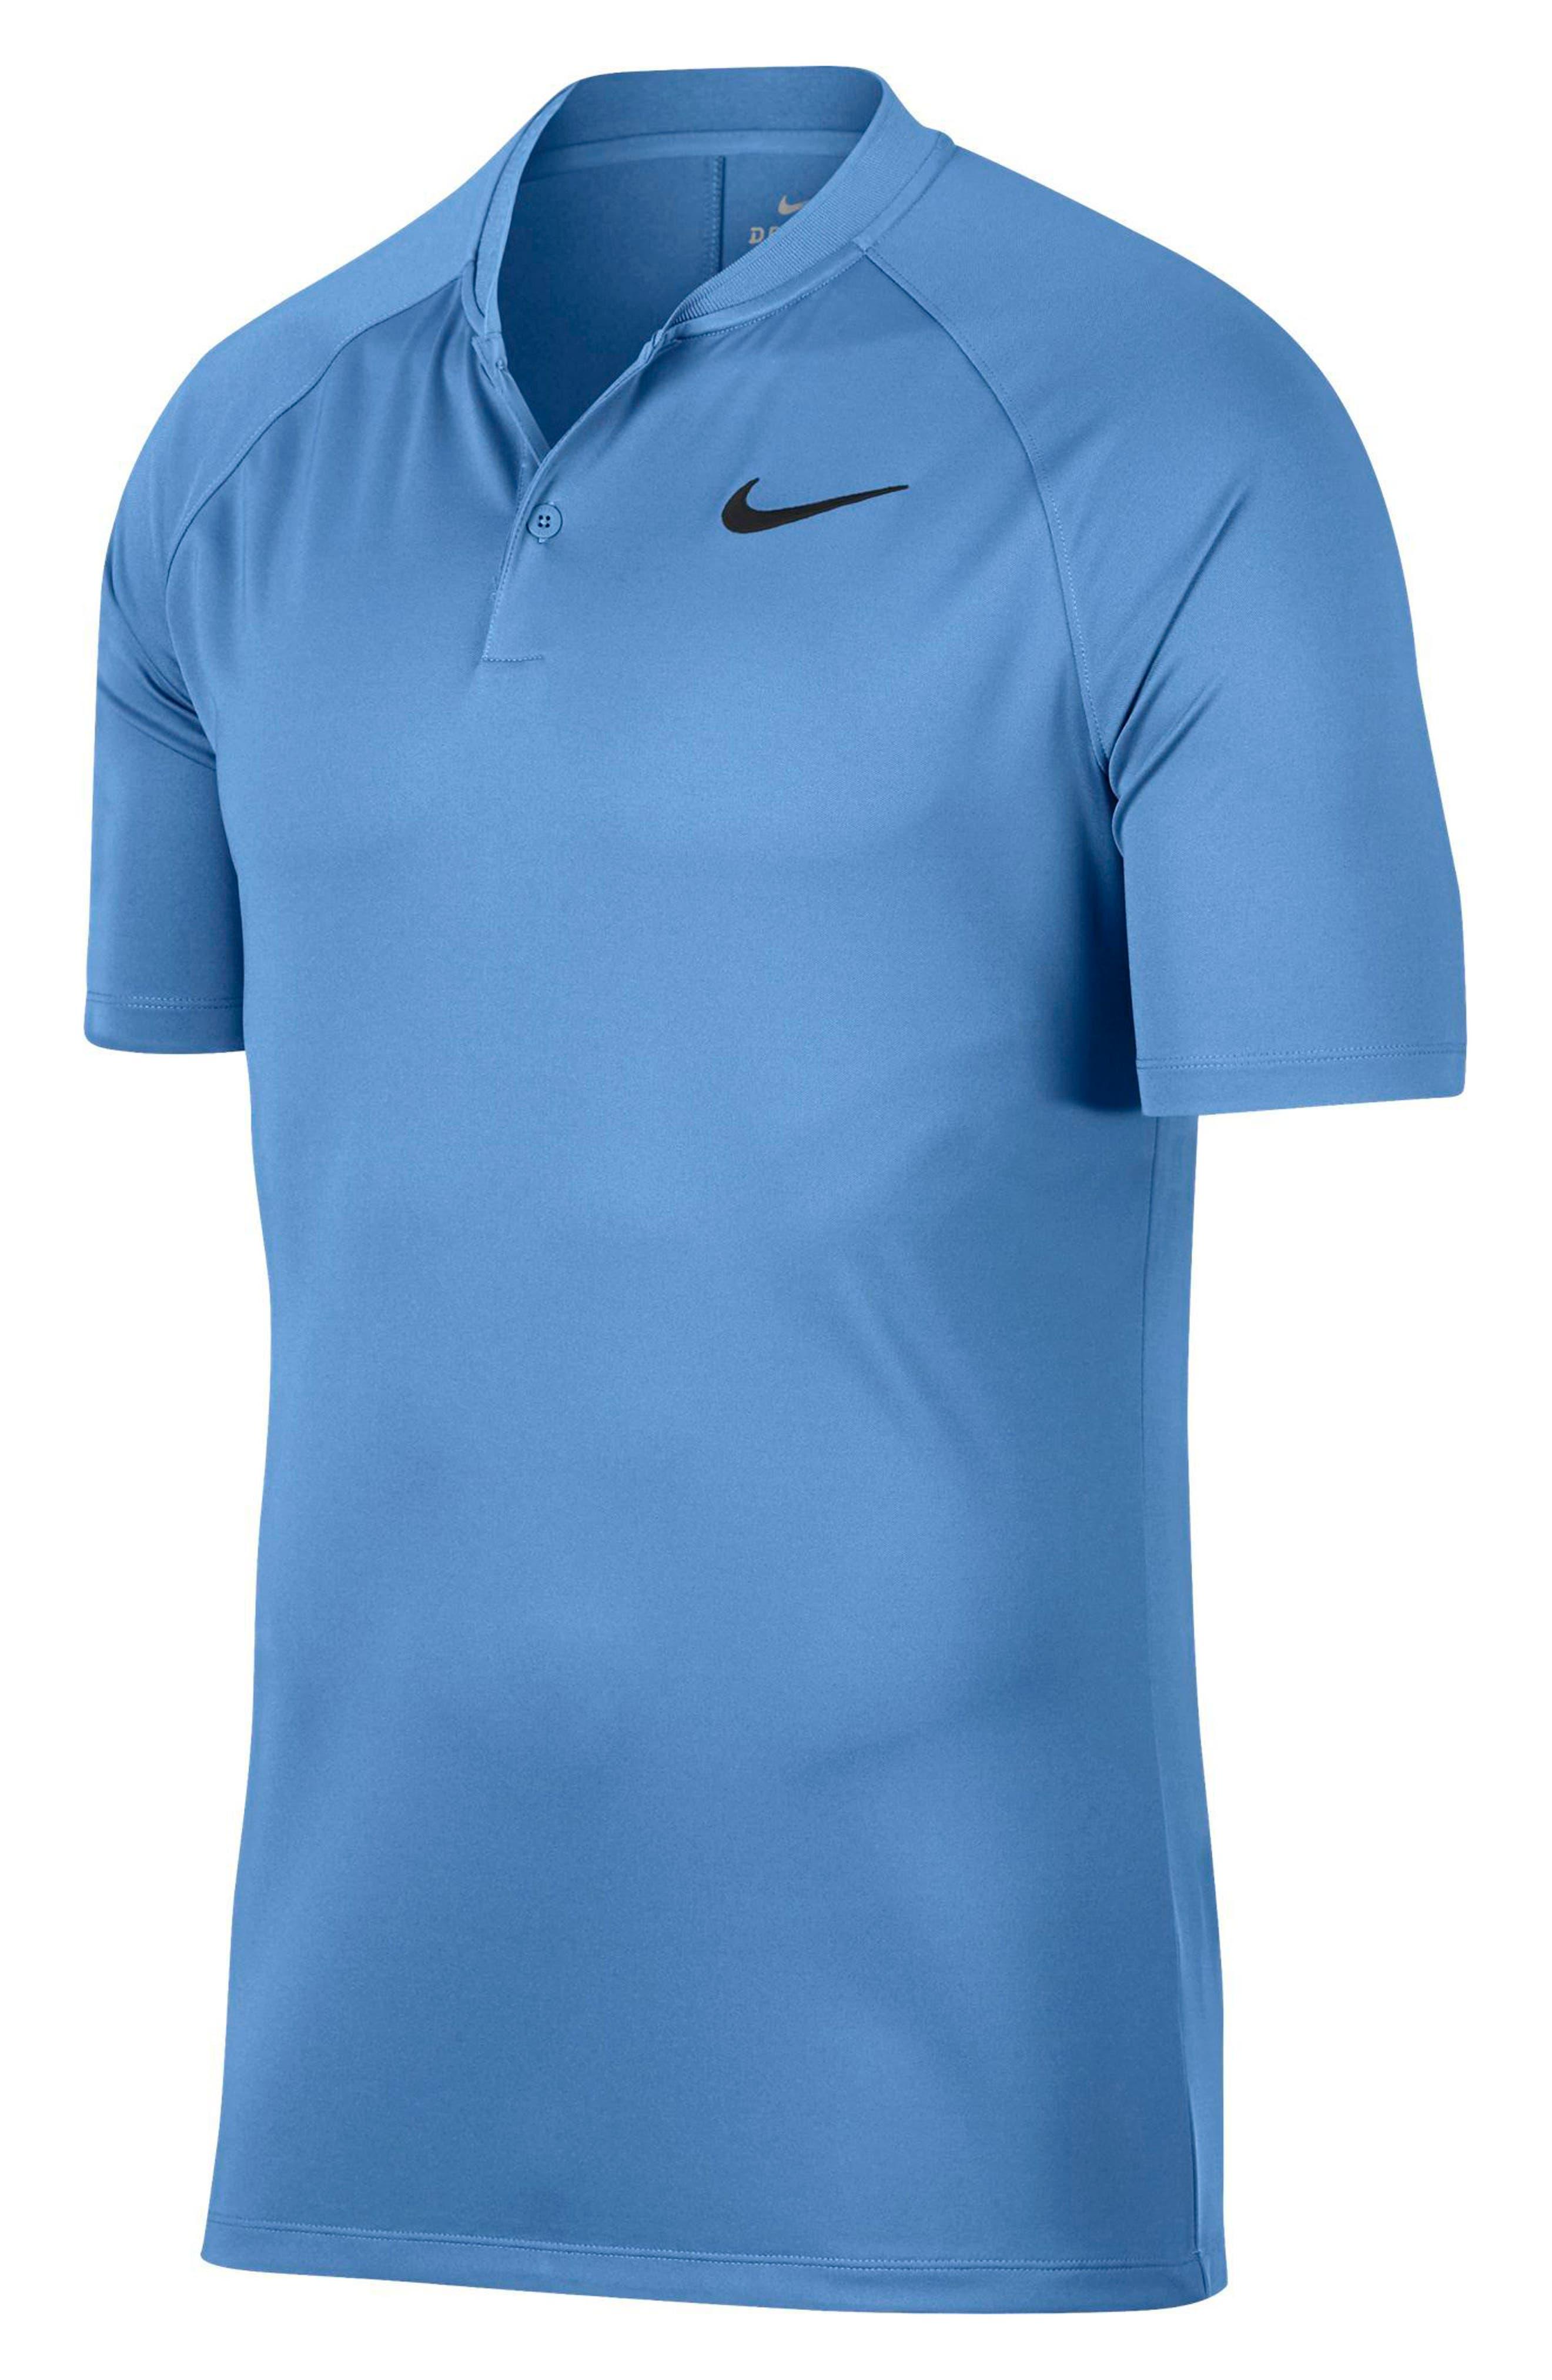 Dry Momentum Golf Polo,                         Main,                         color, University Blue/ White